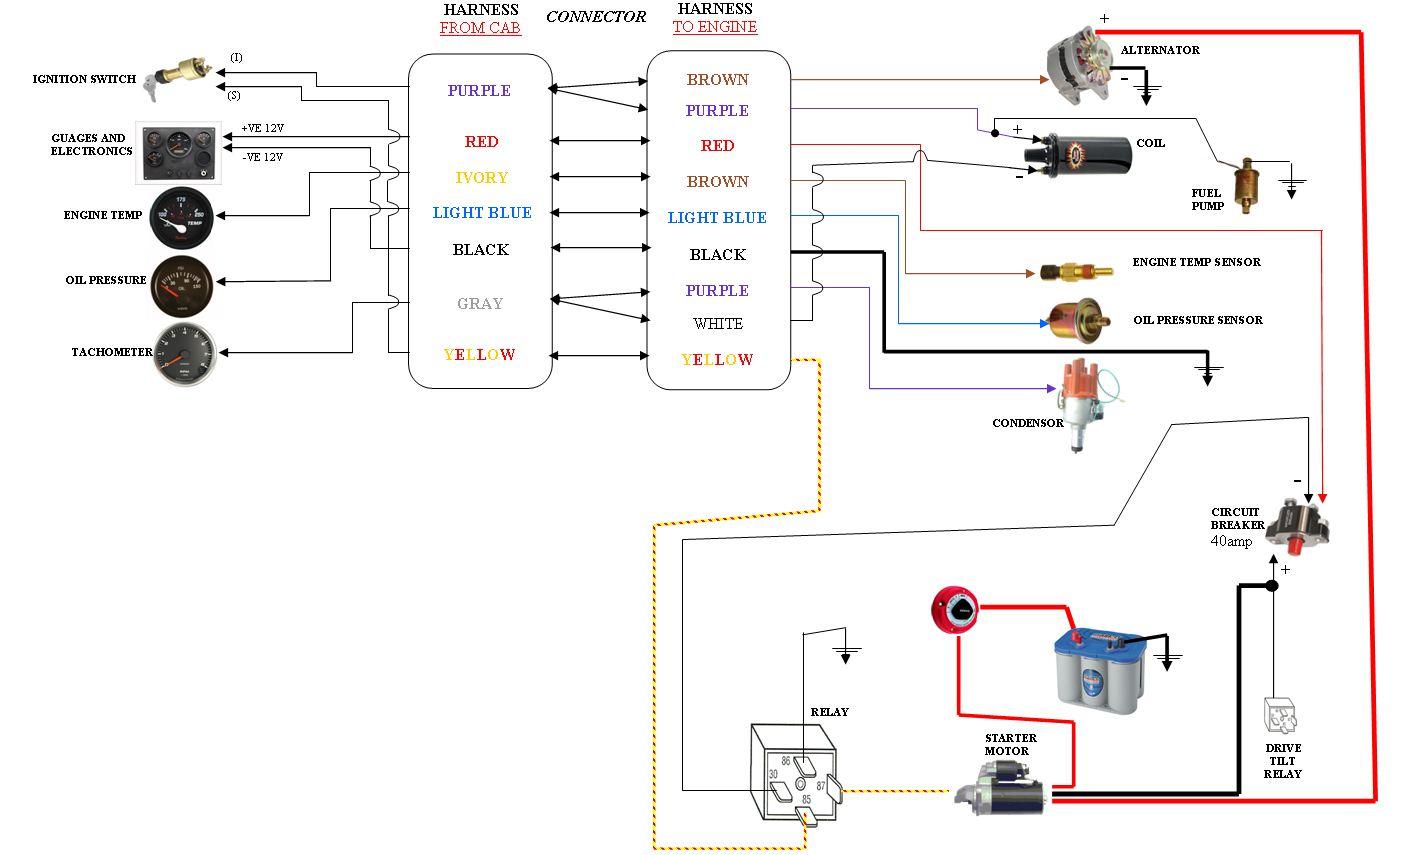 [DIAGRAM_5NL]  VZ_8725] Volvo Ignition Wiring Diagram   Inboard Boat Ignition Switch Wiring Diagram      Joni Gray Cajos Mohammedshrine Librar Wiring 101